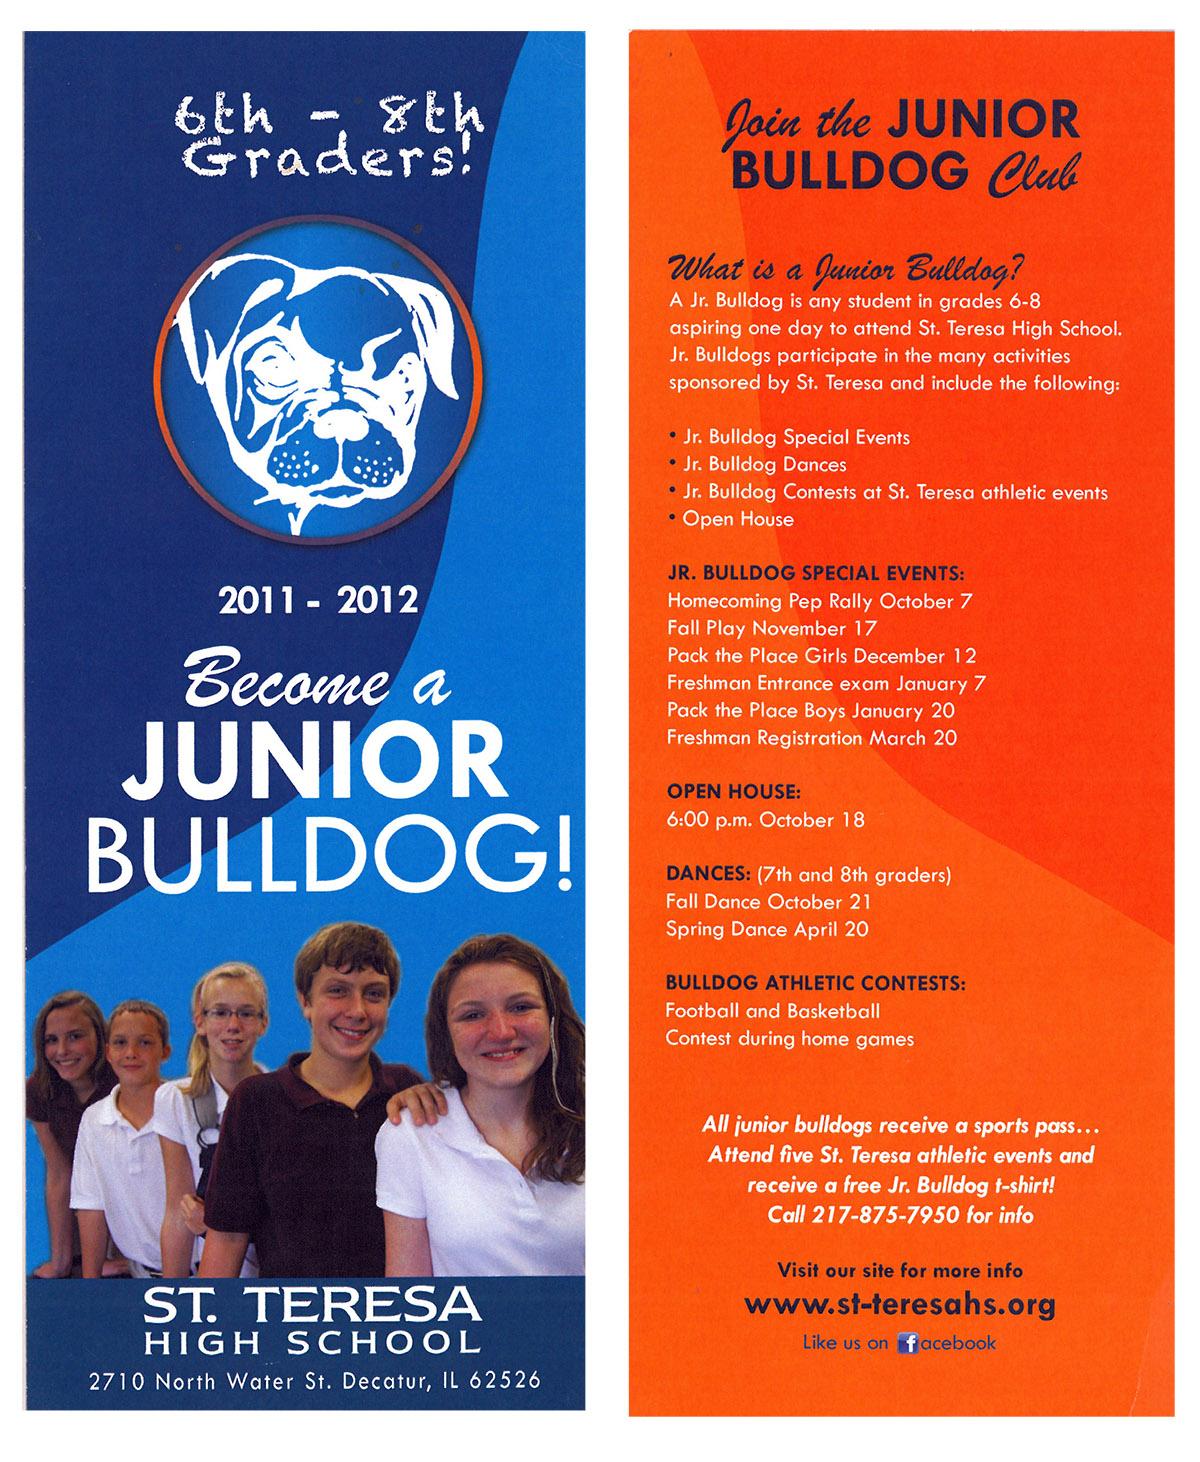 Junior Bulldog Brochure front and back